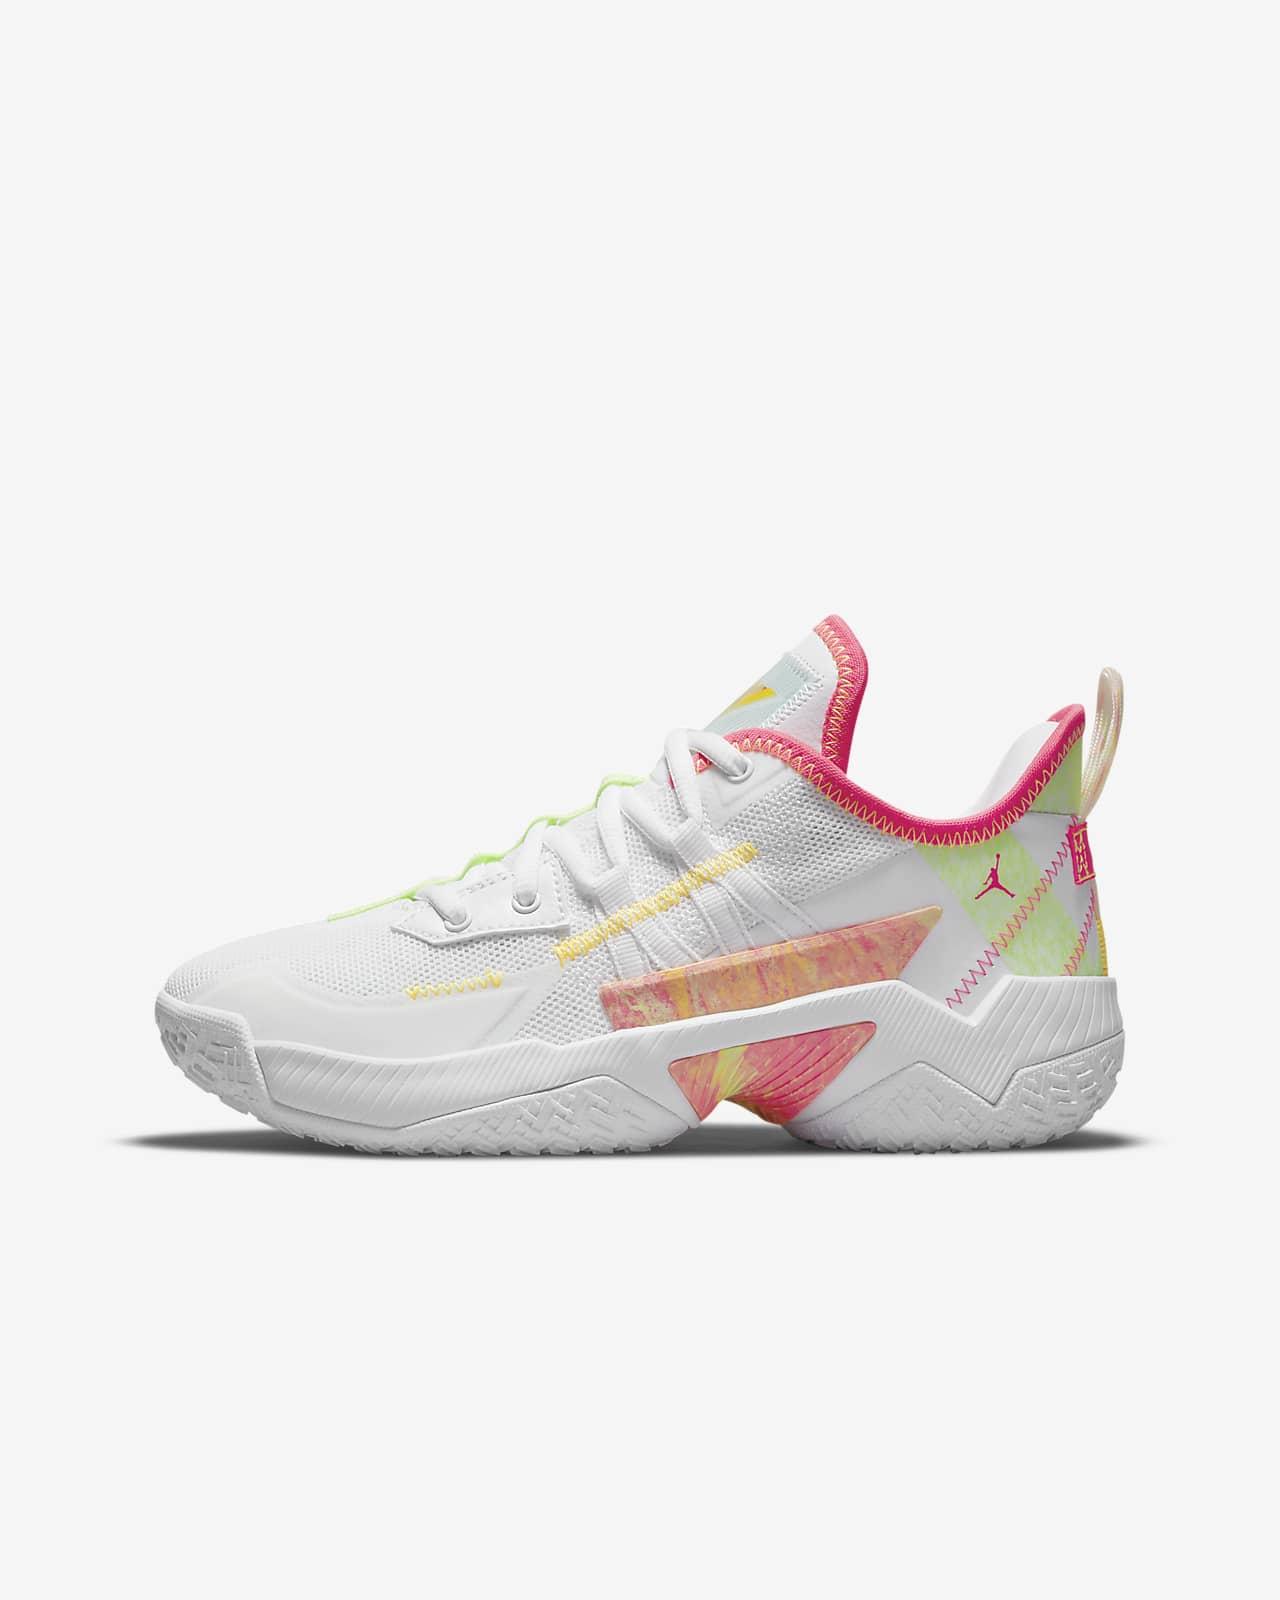 Jordan One Take II Big Kids' Basketball Shoes